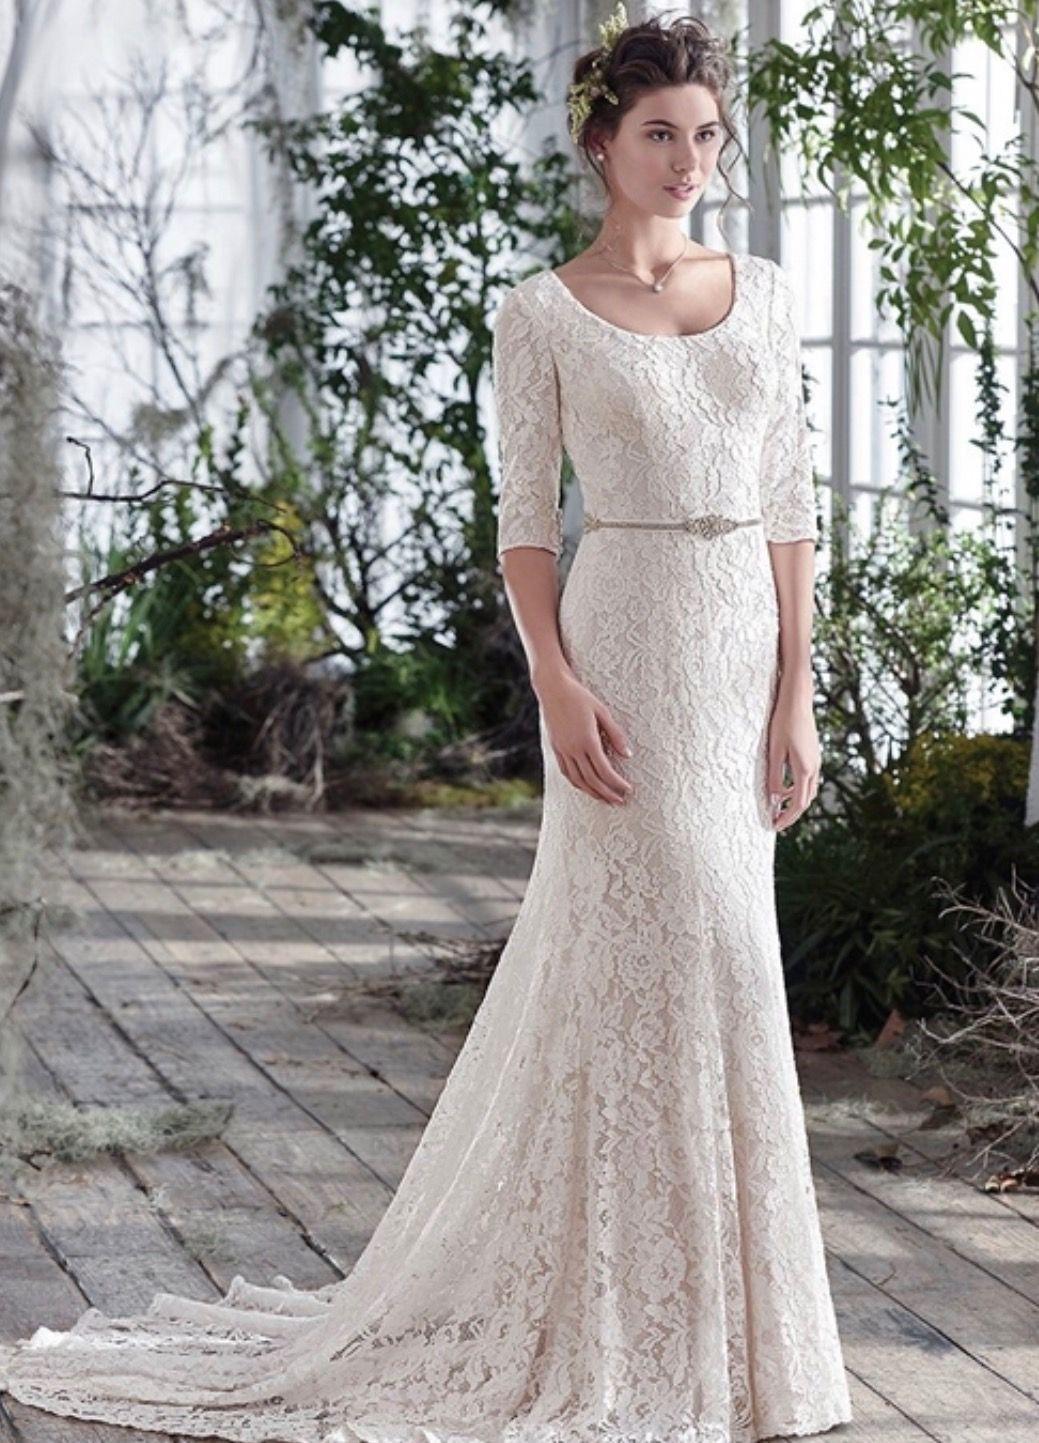 Pin by aimee favela on wedding dress pinterest wedding dress and